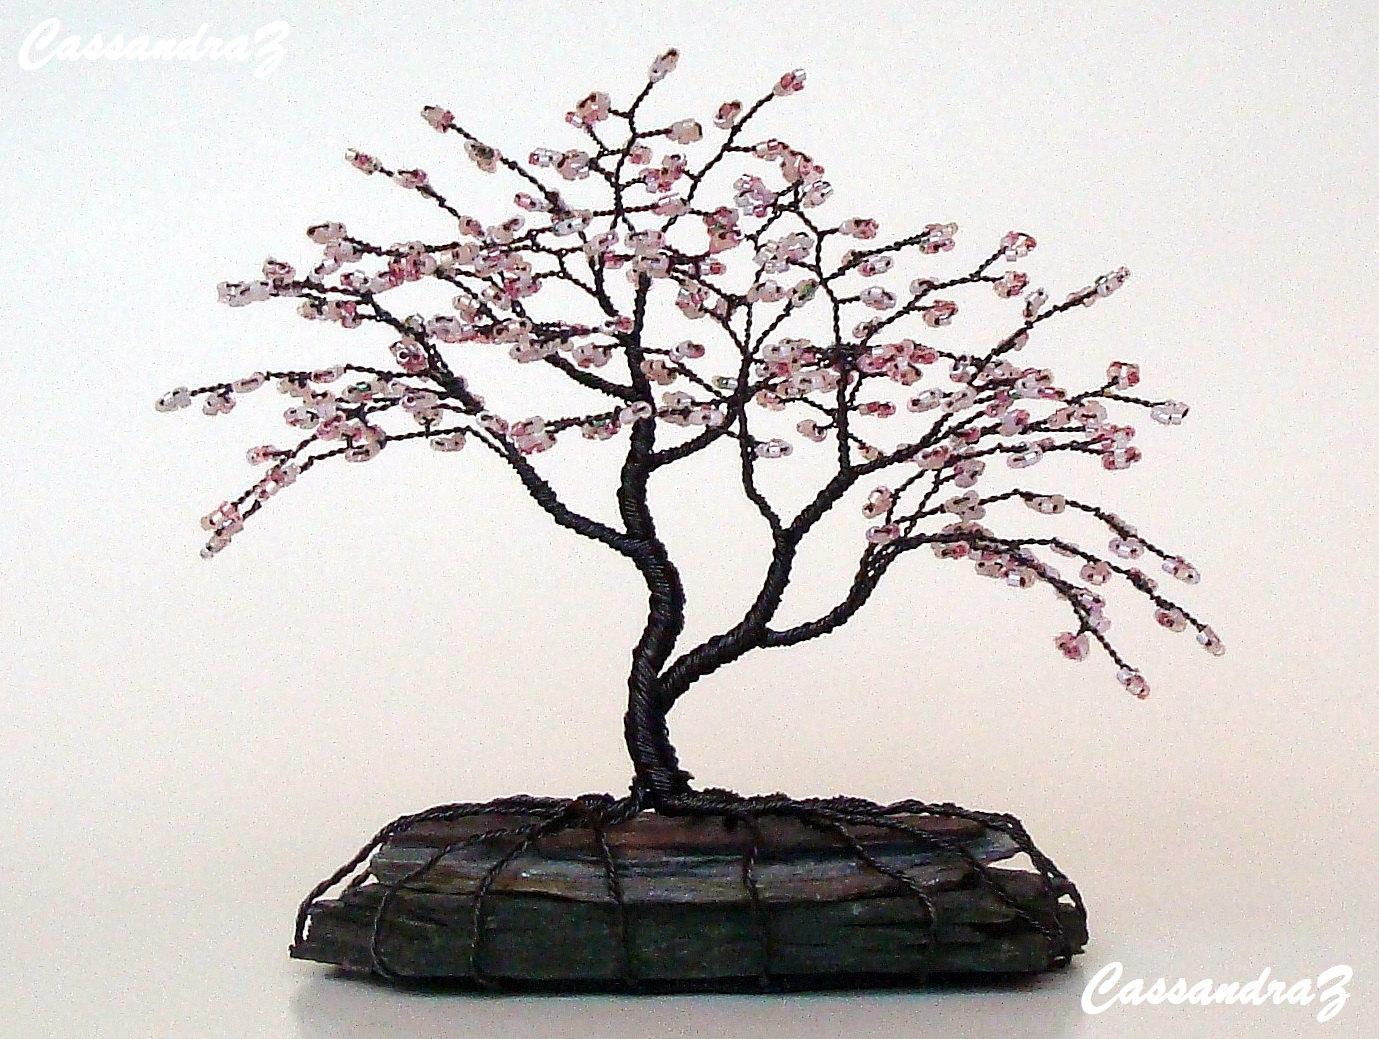 Drawn sakura blossom bonsai tree For Tree jpeg Bonsai x